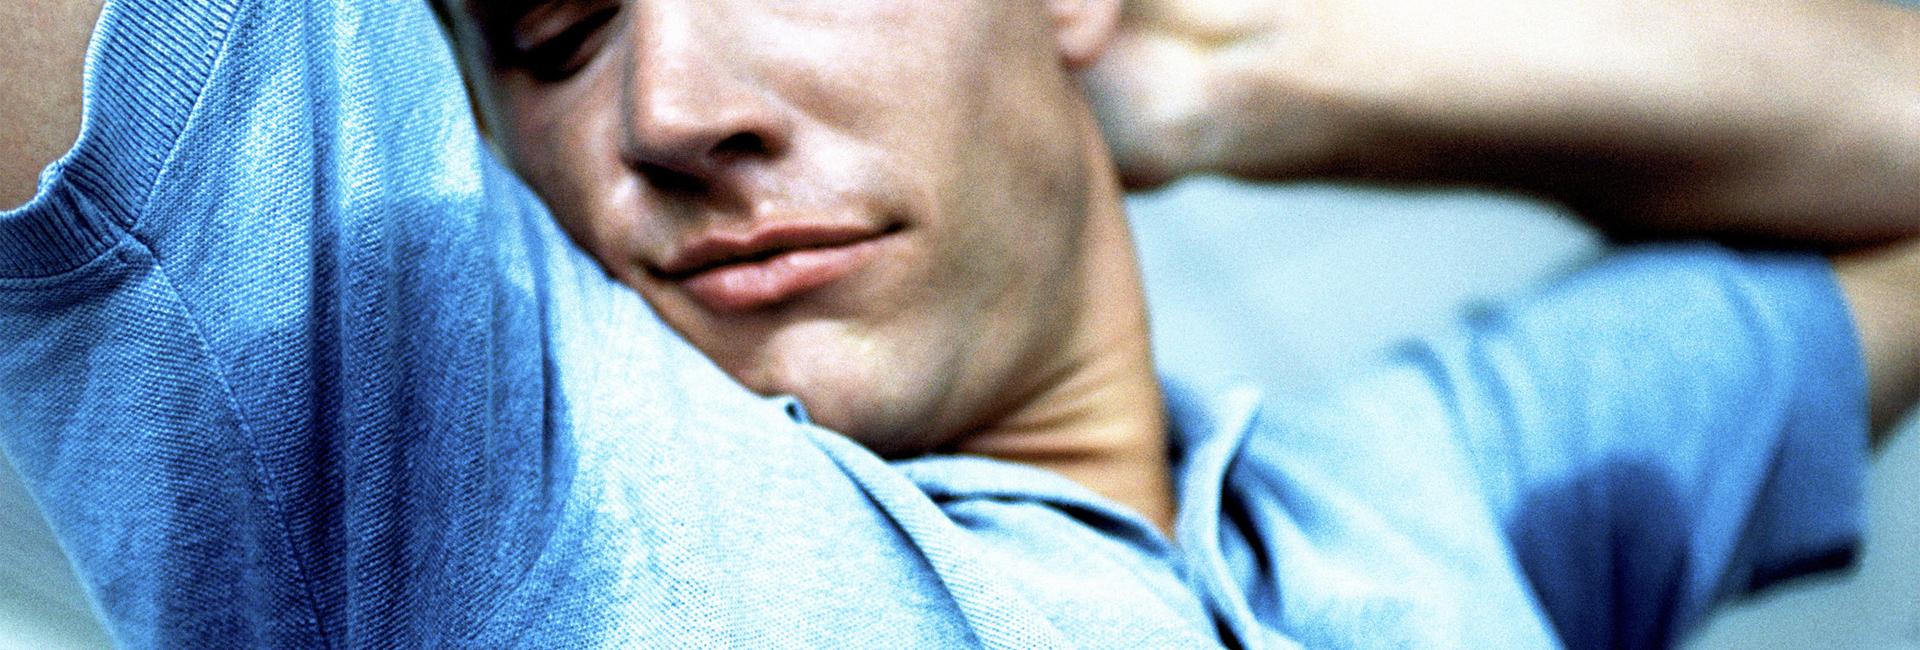 homme-tranpiration-odeurs-traces-blog-beaute-soin-parfum-homme